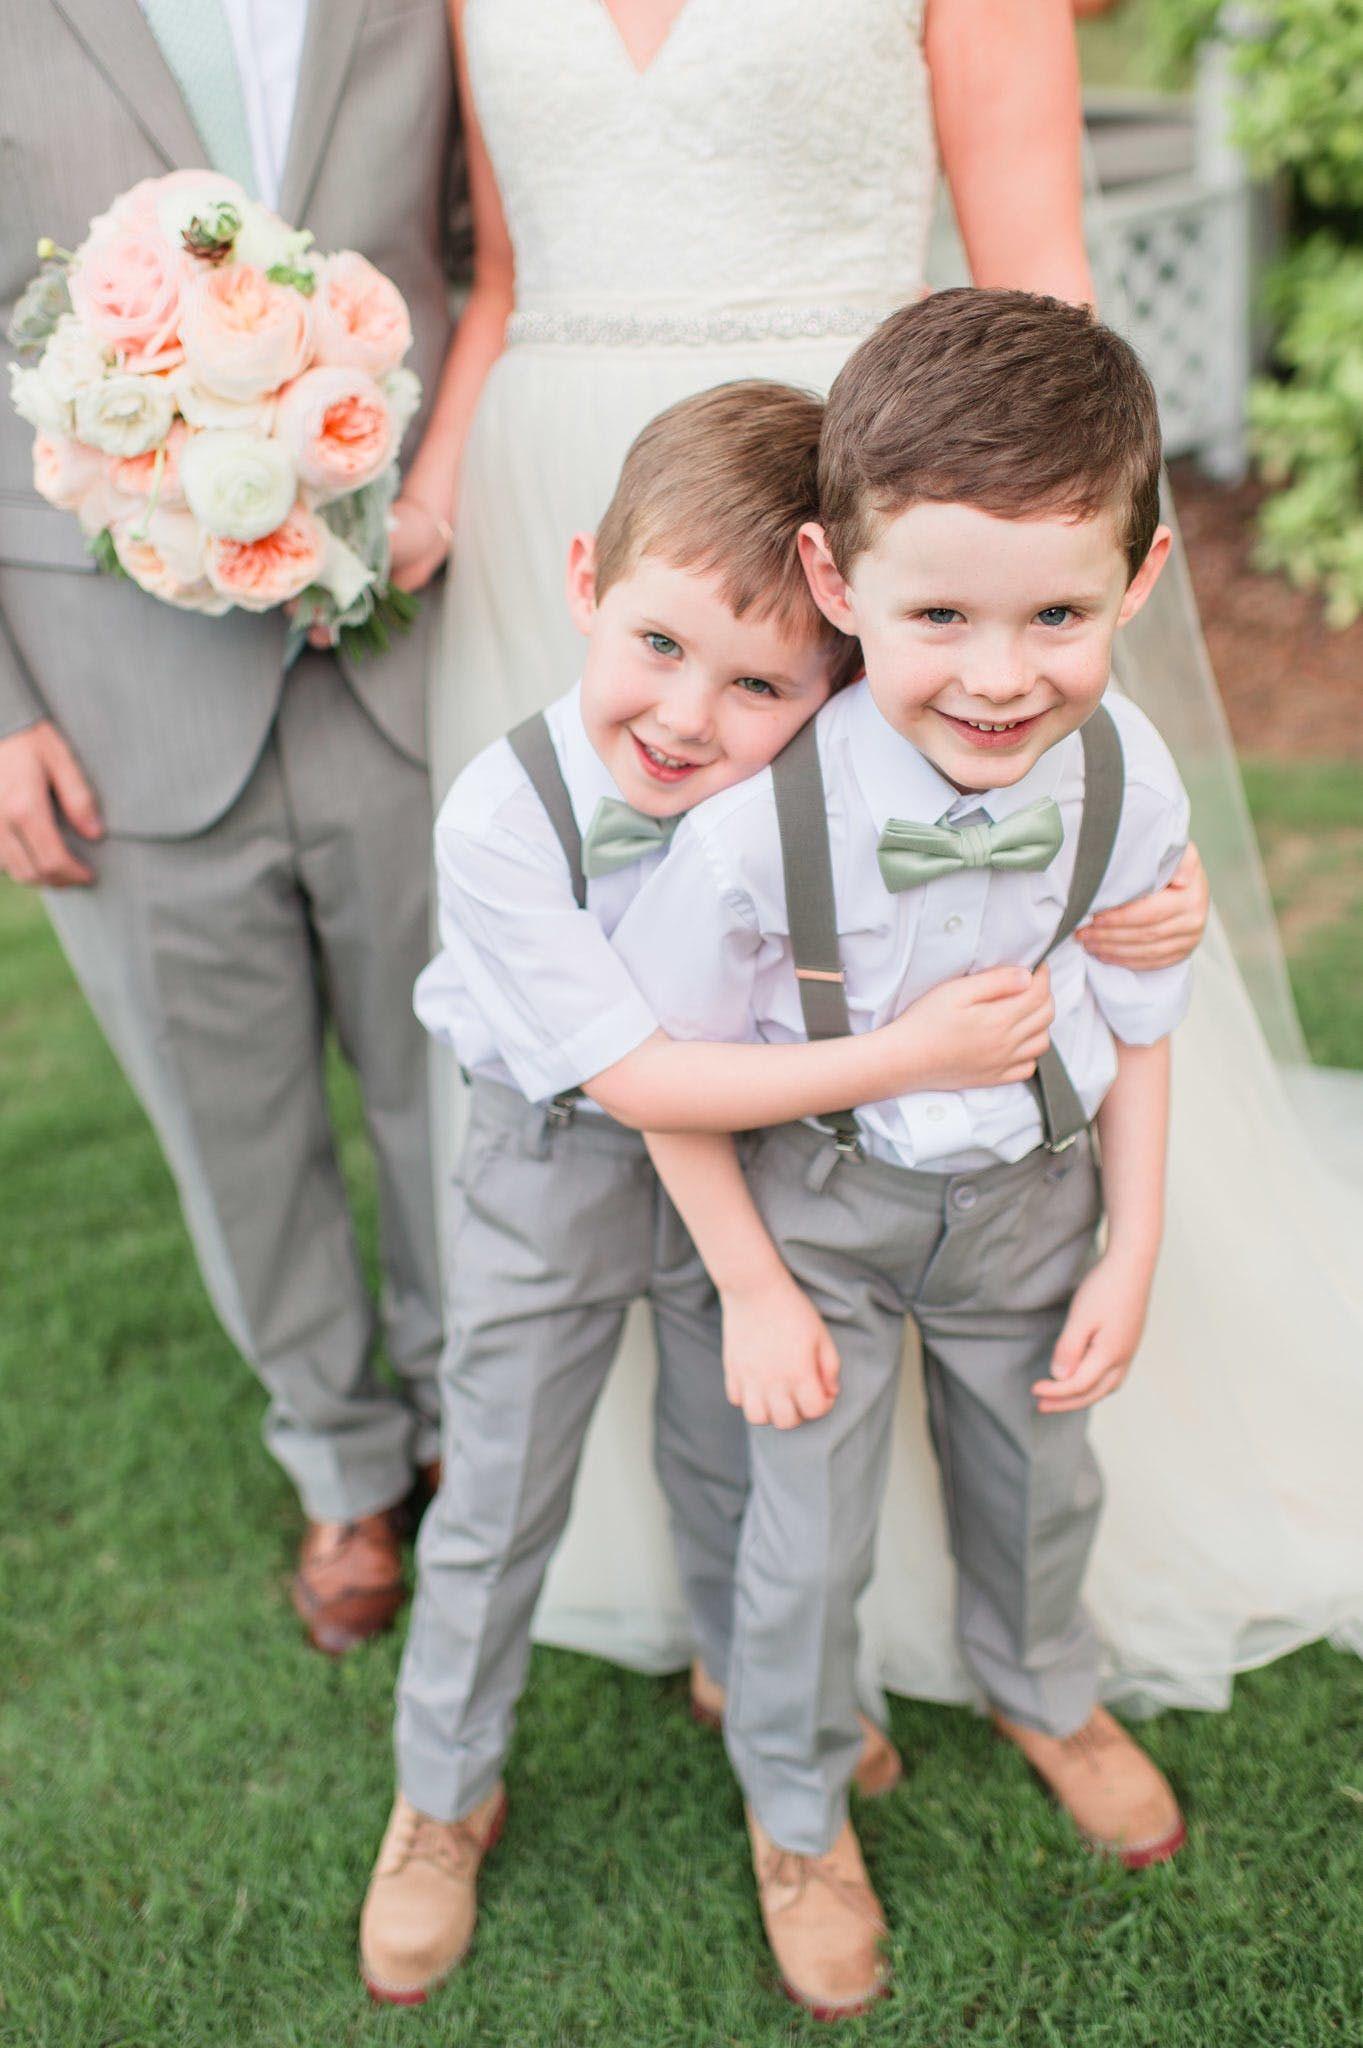 Toddler boy dress clothes for wedding  Elegant Southern Wedding at Little River Farms  wedding  Pinterest